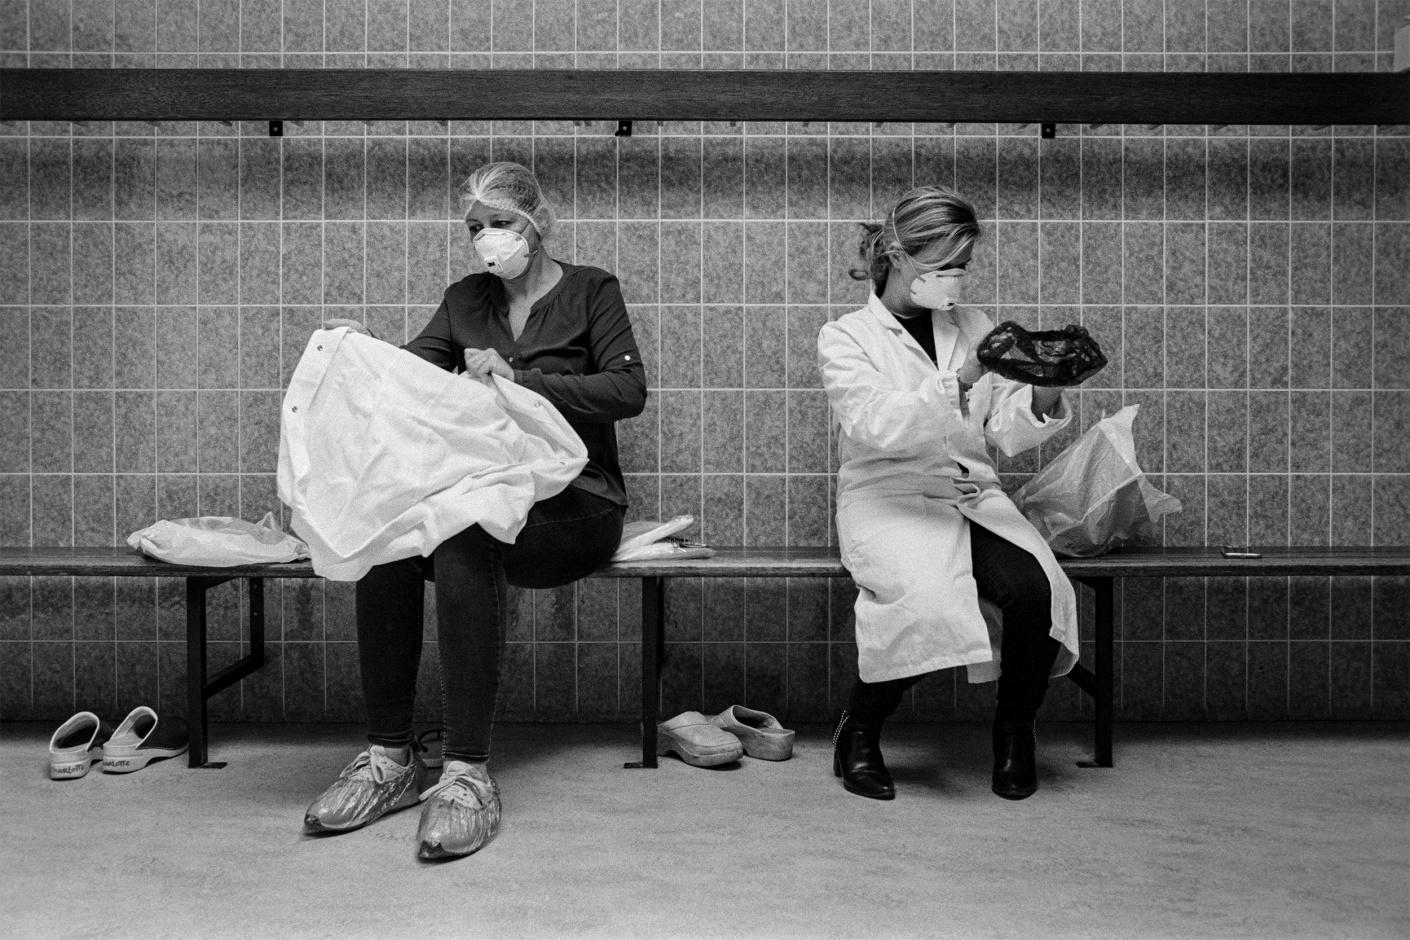 1 | CORONA | OPPENHEIM | Jelle Pieter de Boer